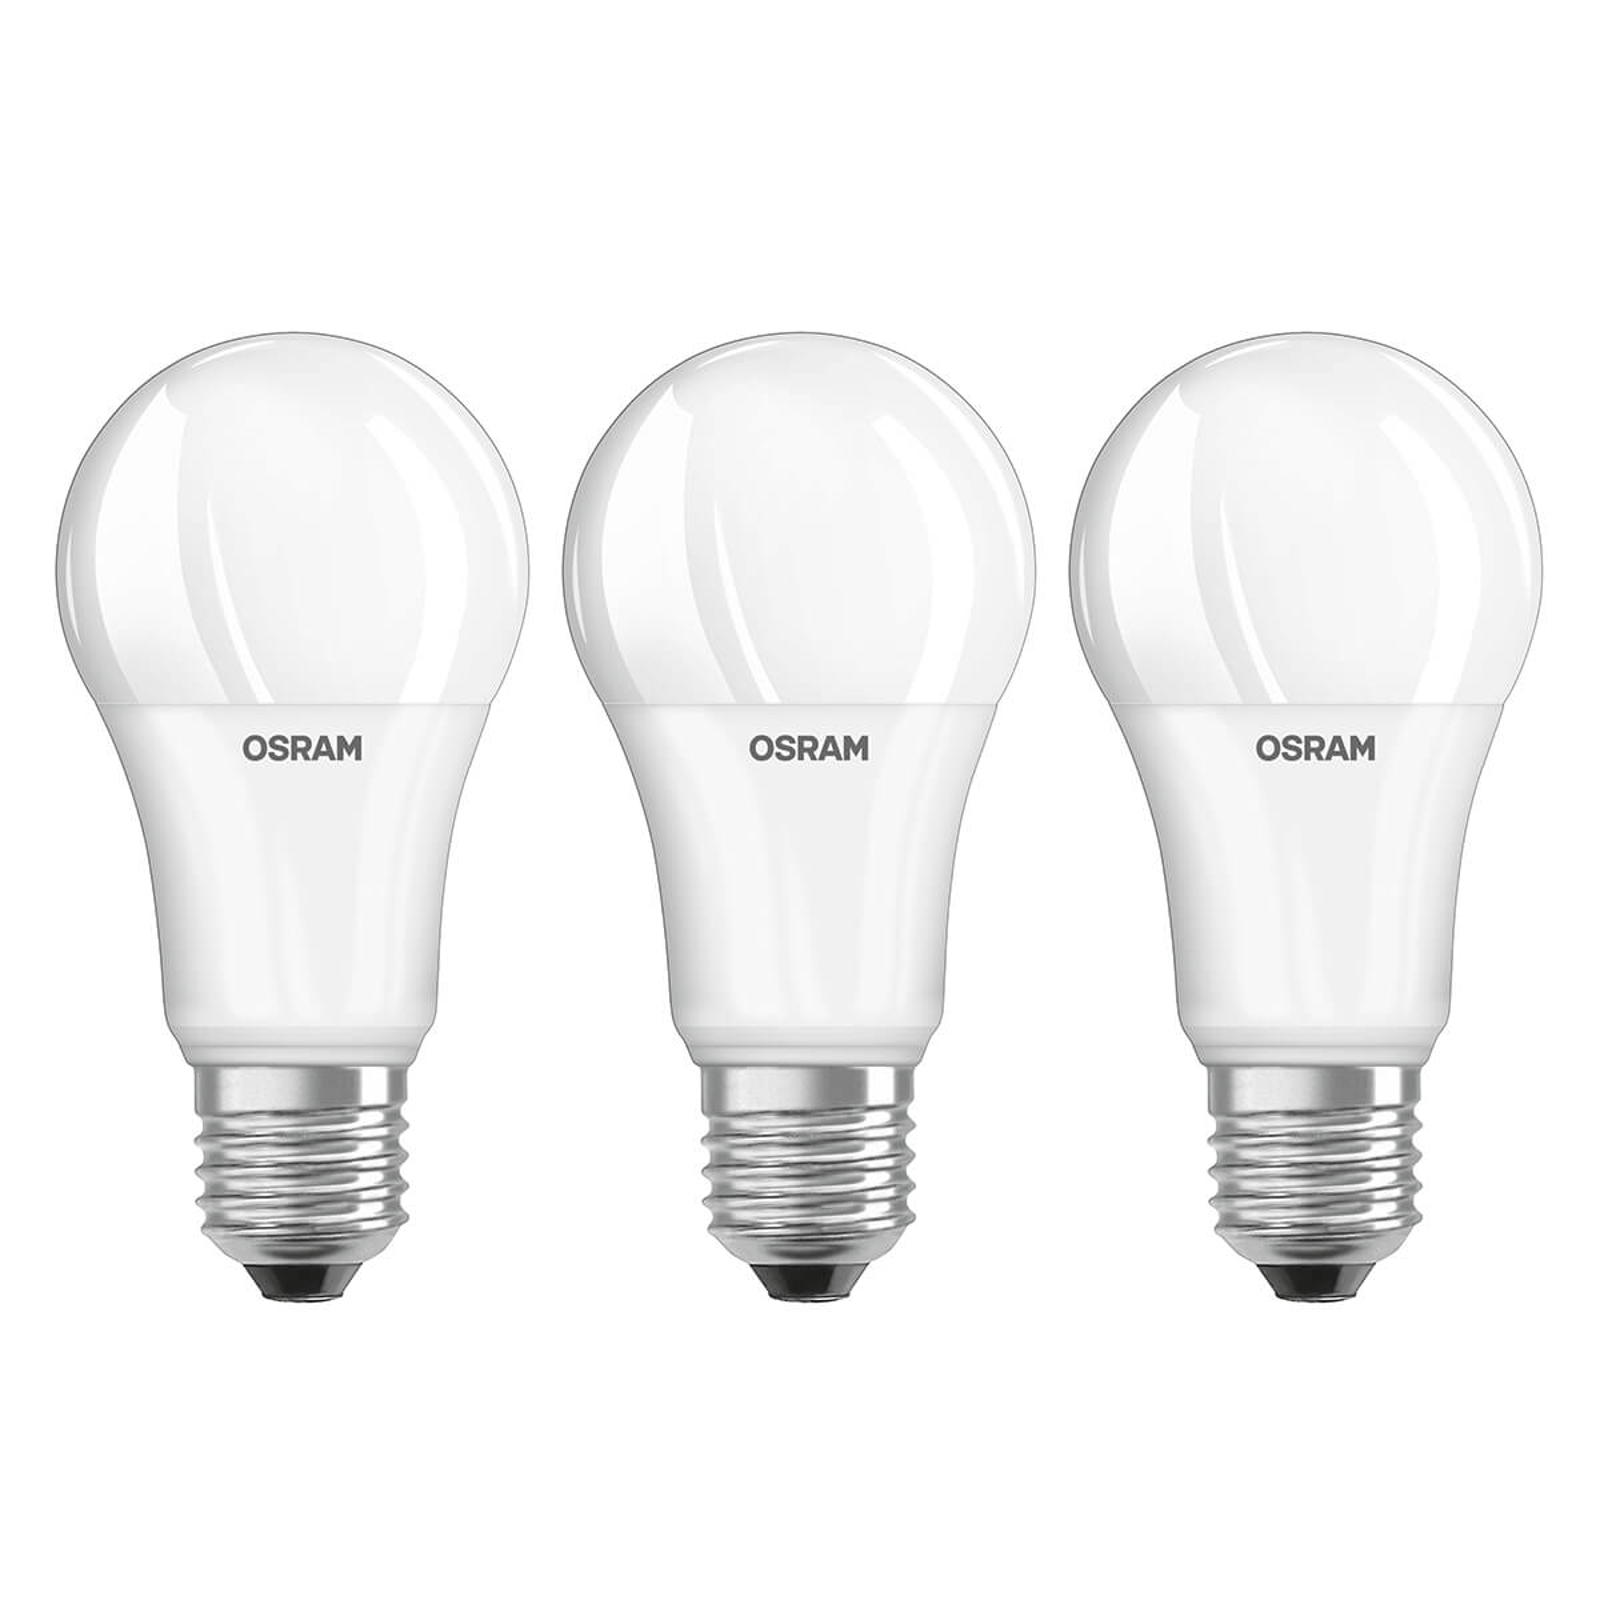 LED-Lampe E27 13W, universalweiß, 3er-Set